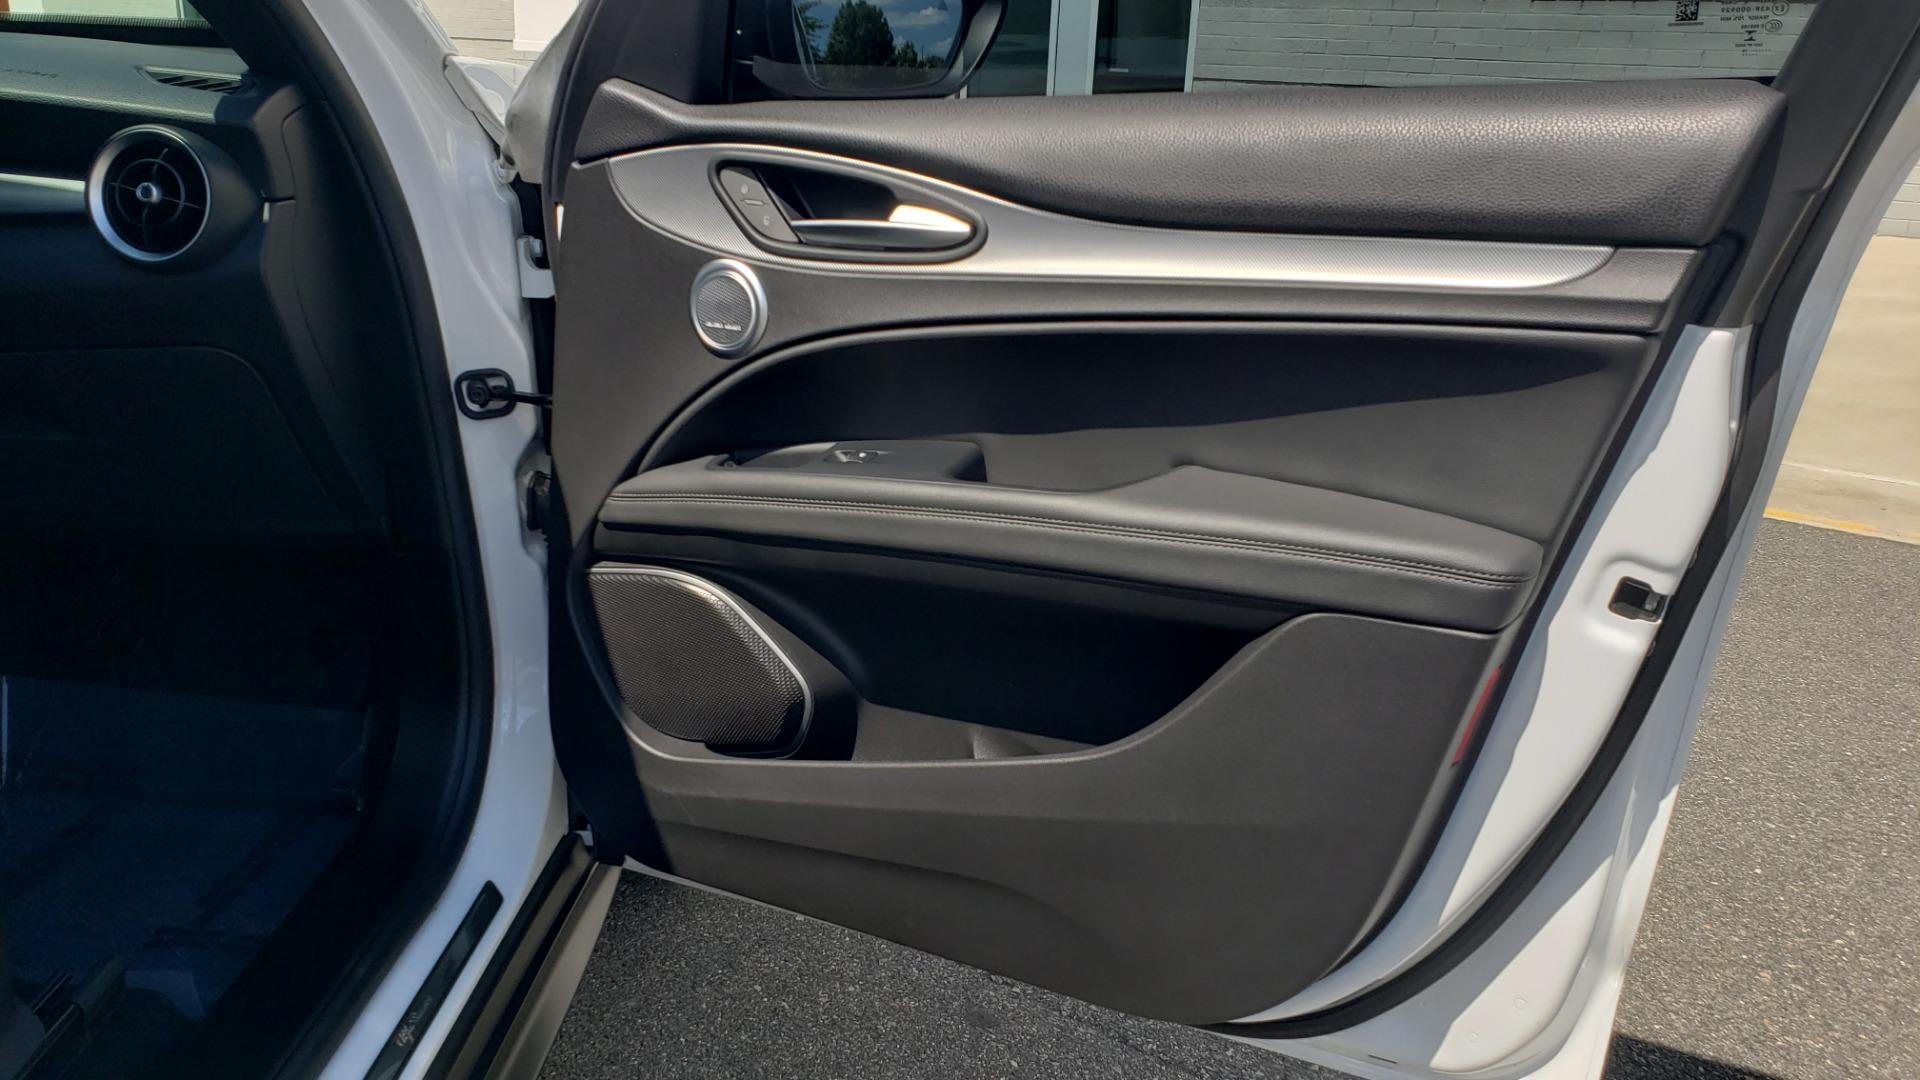 Used 2019 Alfa Romeo STELVIO TI SPORT AWD / 2.0L TURBO / 8-SPD AUTO / DRVR ASST / REARVIEW for sale $37,495 at Formula Imports in Charlotte NC 28227 69